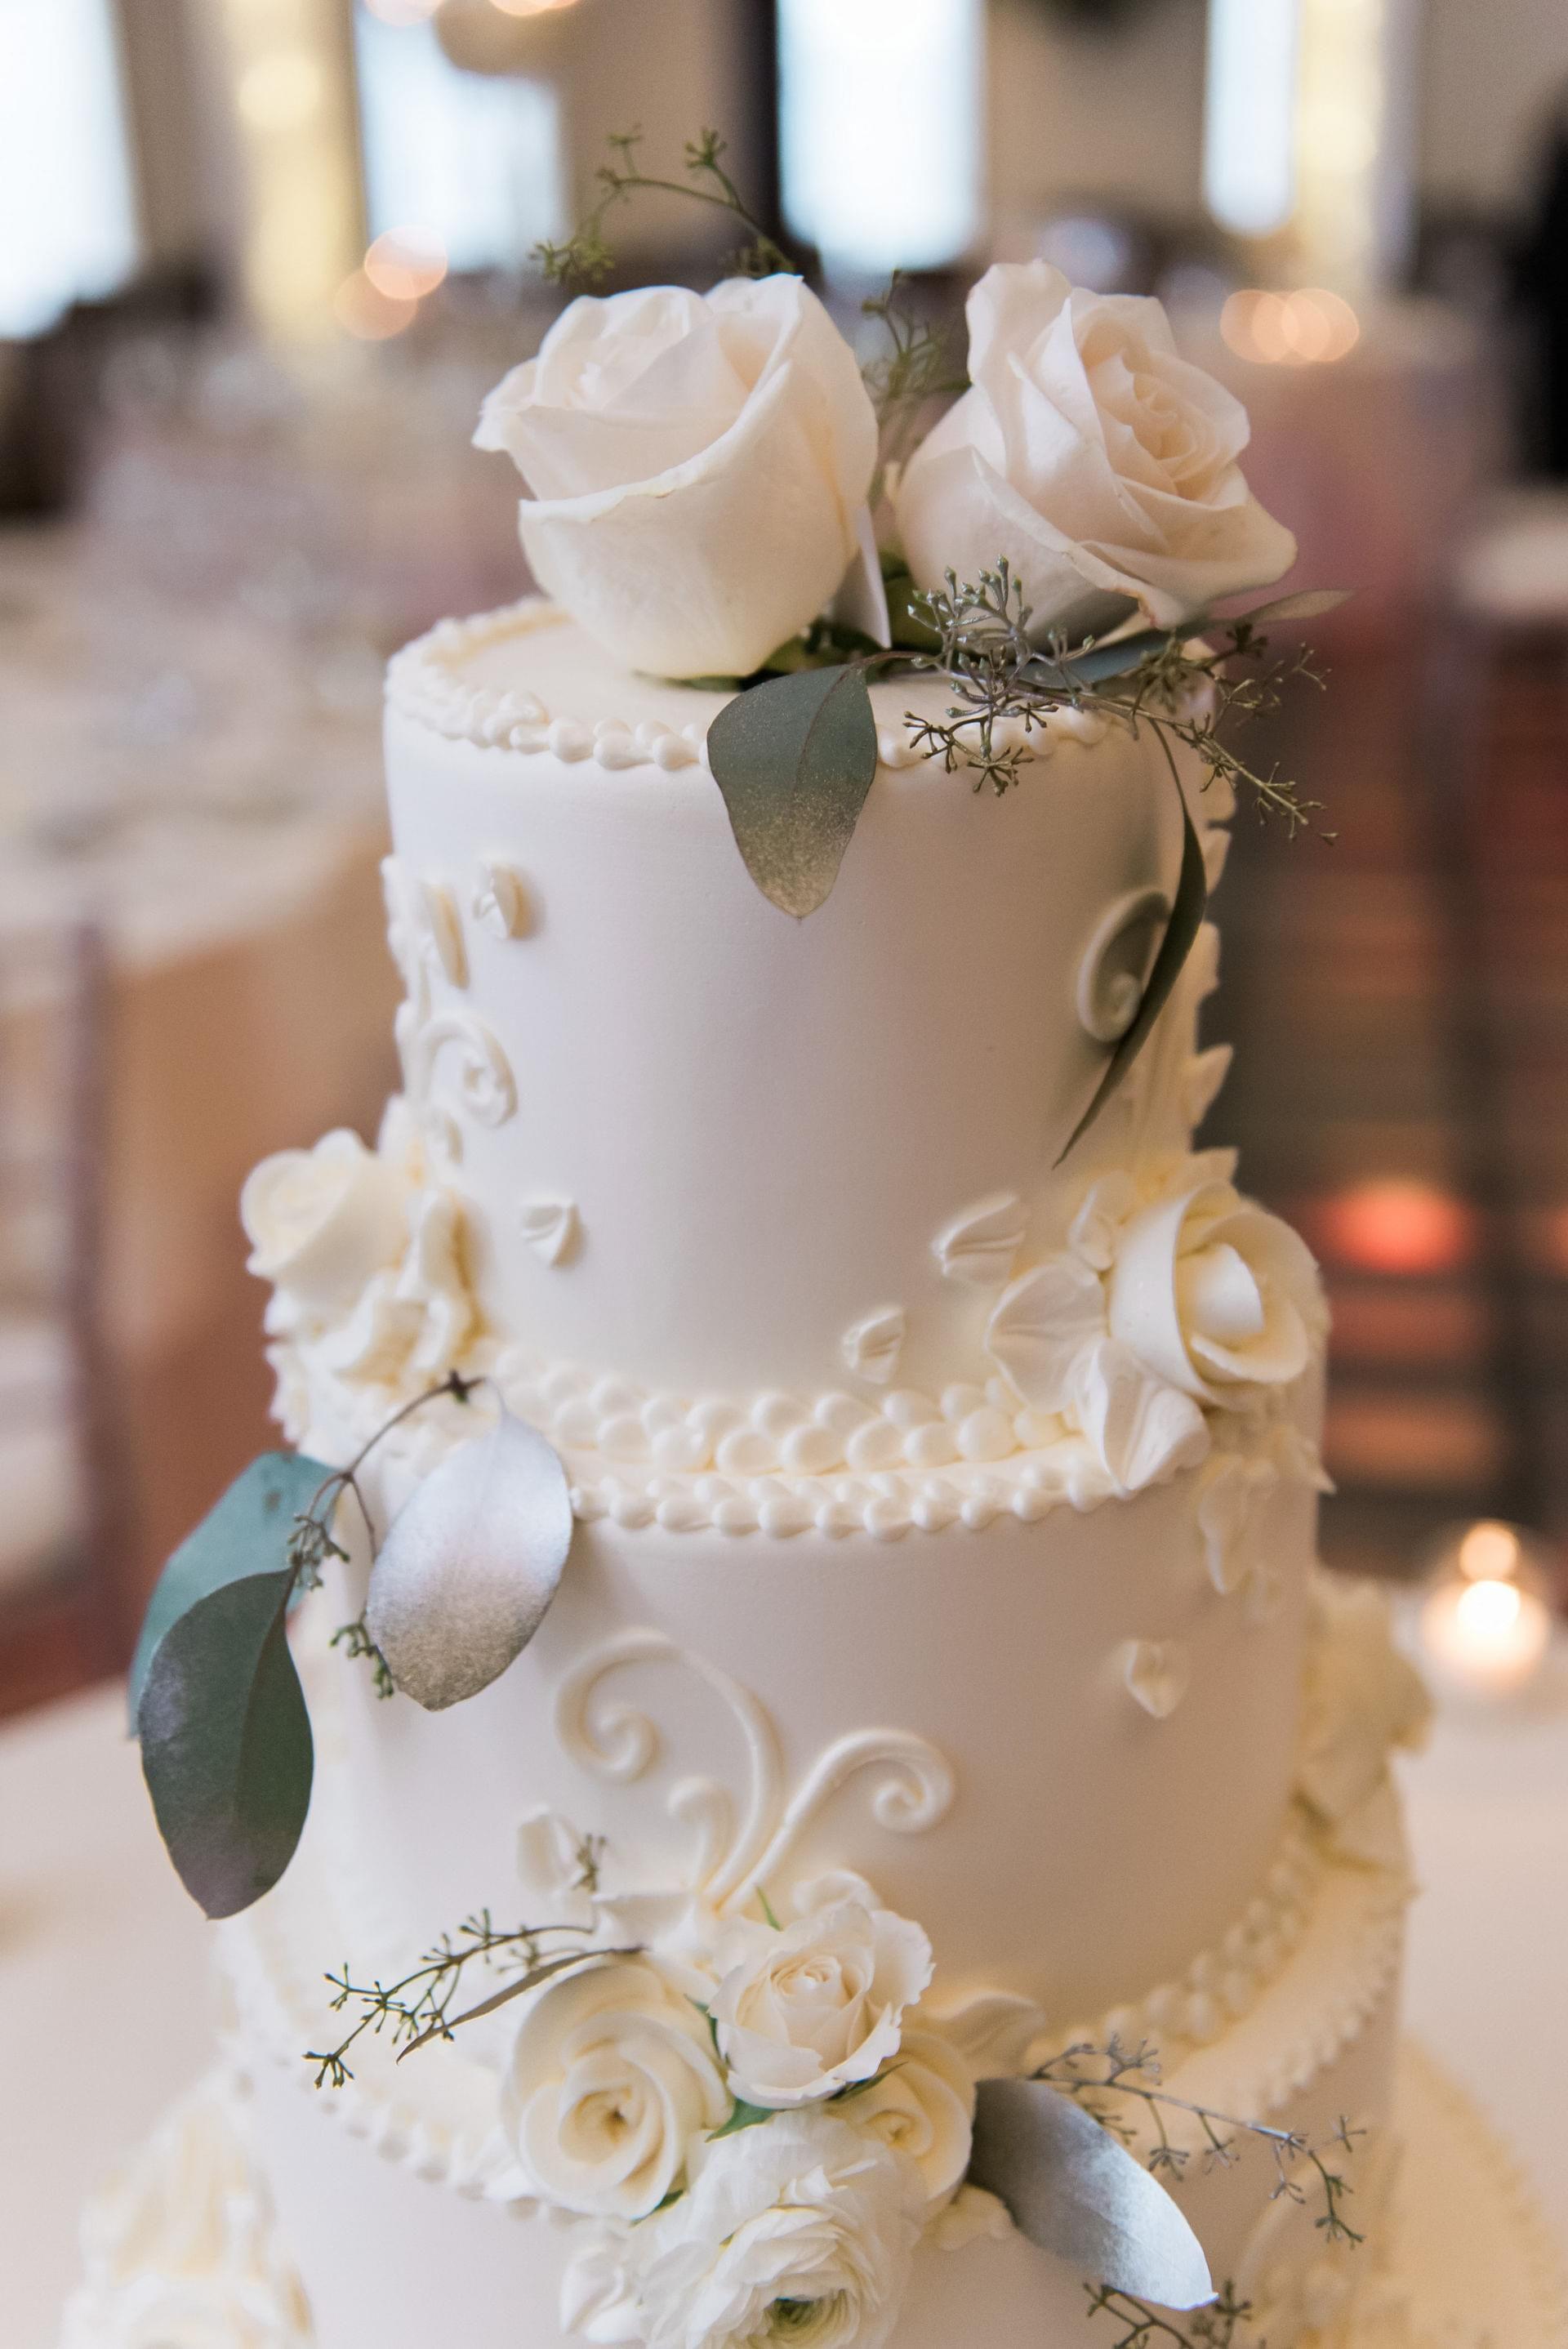 black-tie wedding at hotel baker - st. charles, il | black tie